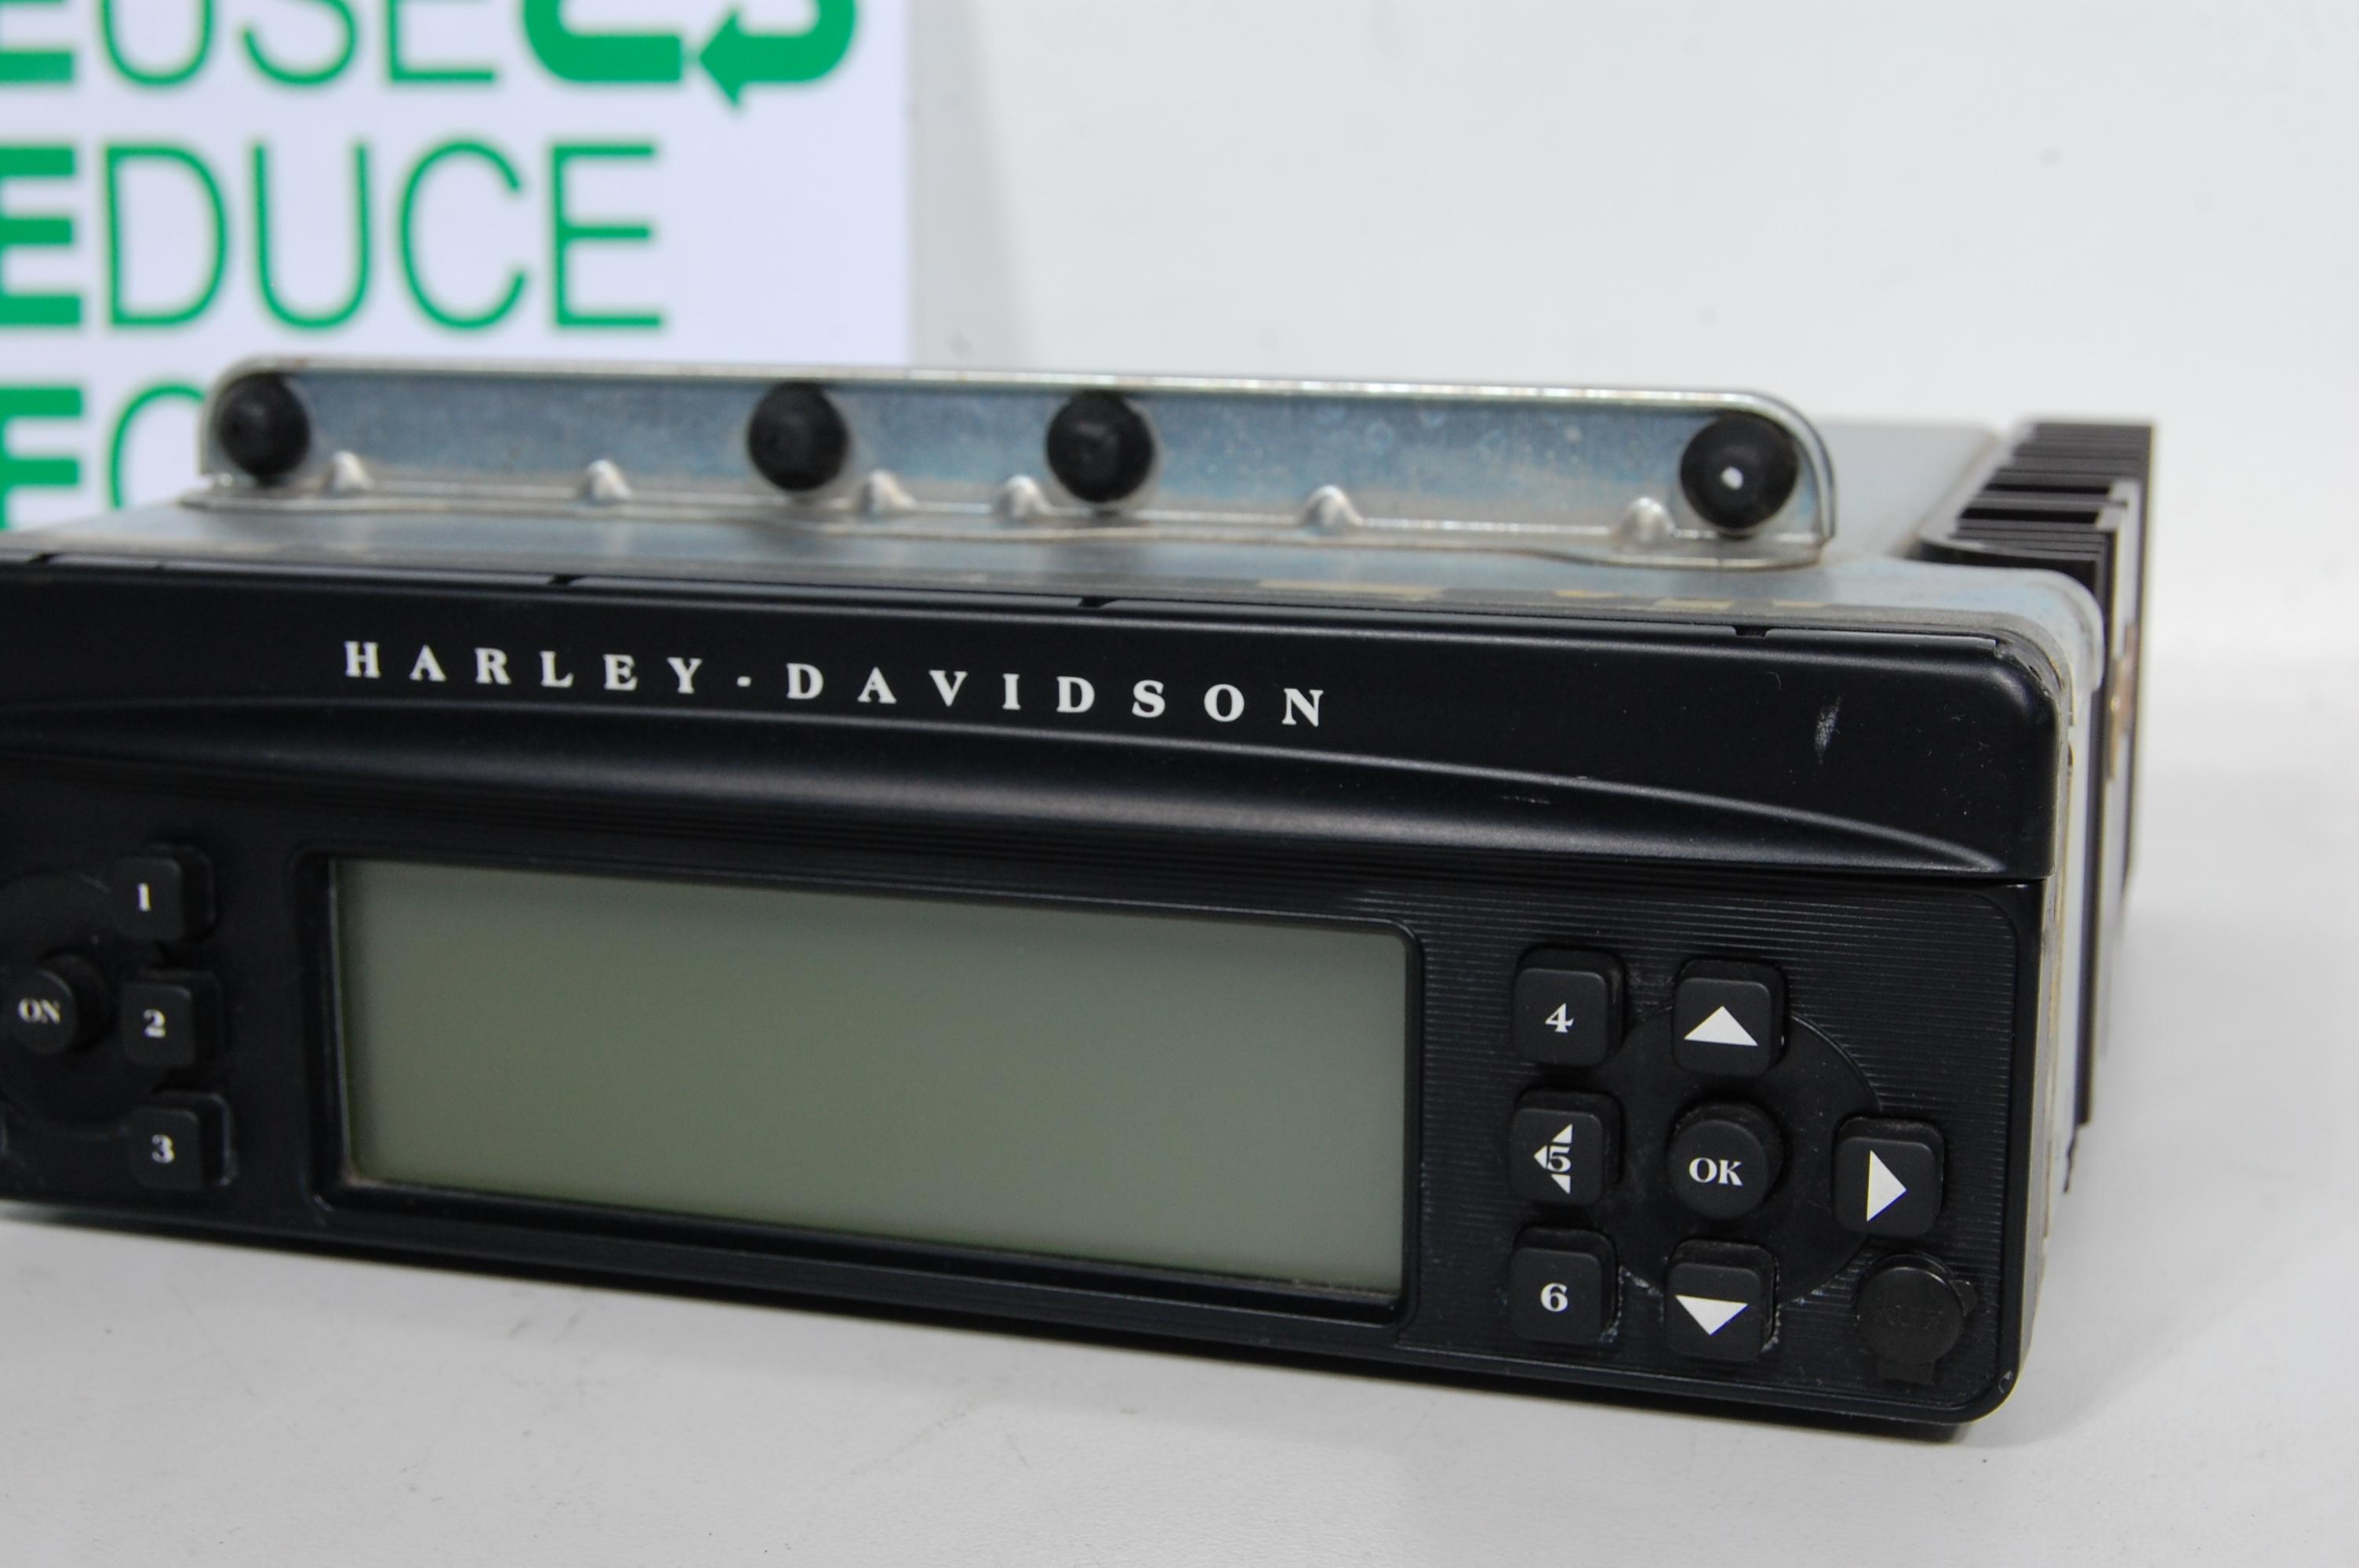 harley davidson harman kardon be 7680 radio as is ebay. Black Bedroom Furniture Sets. Home Design Ideas